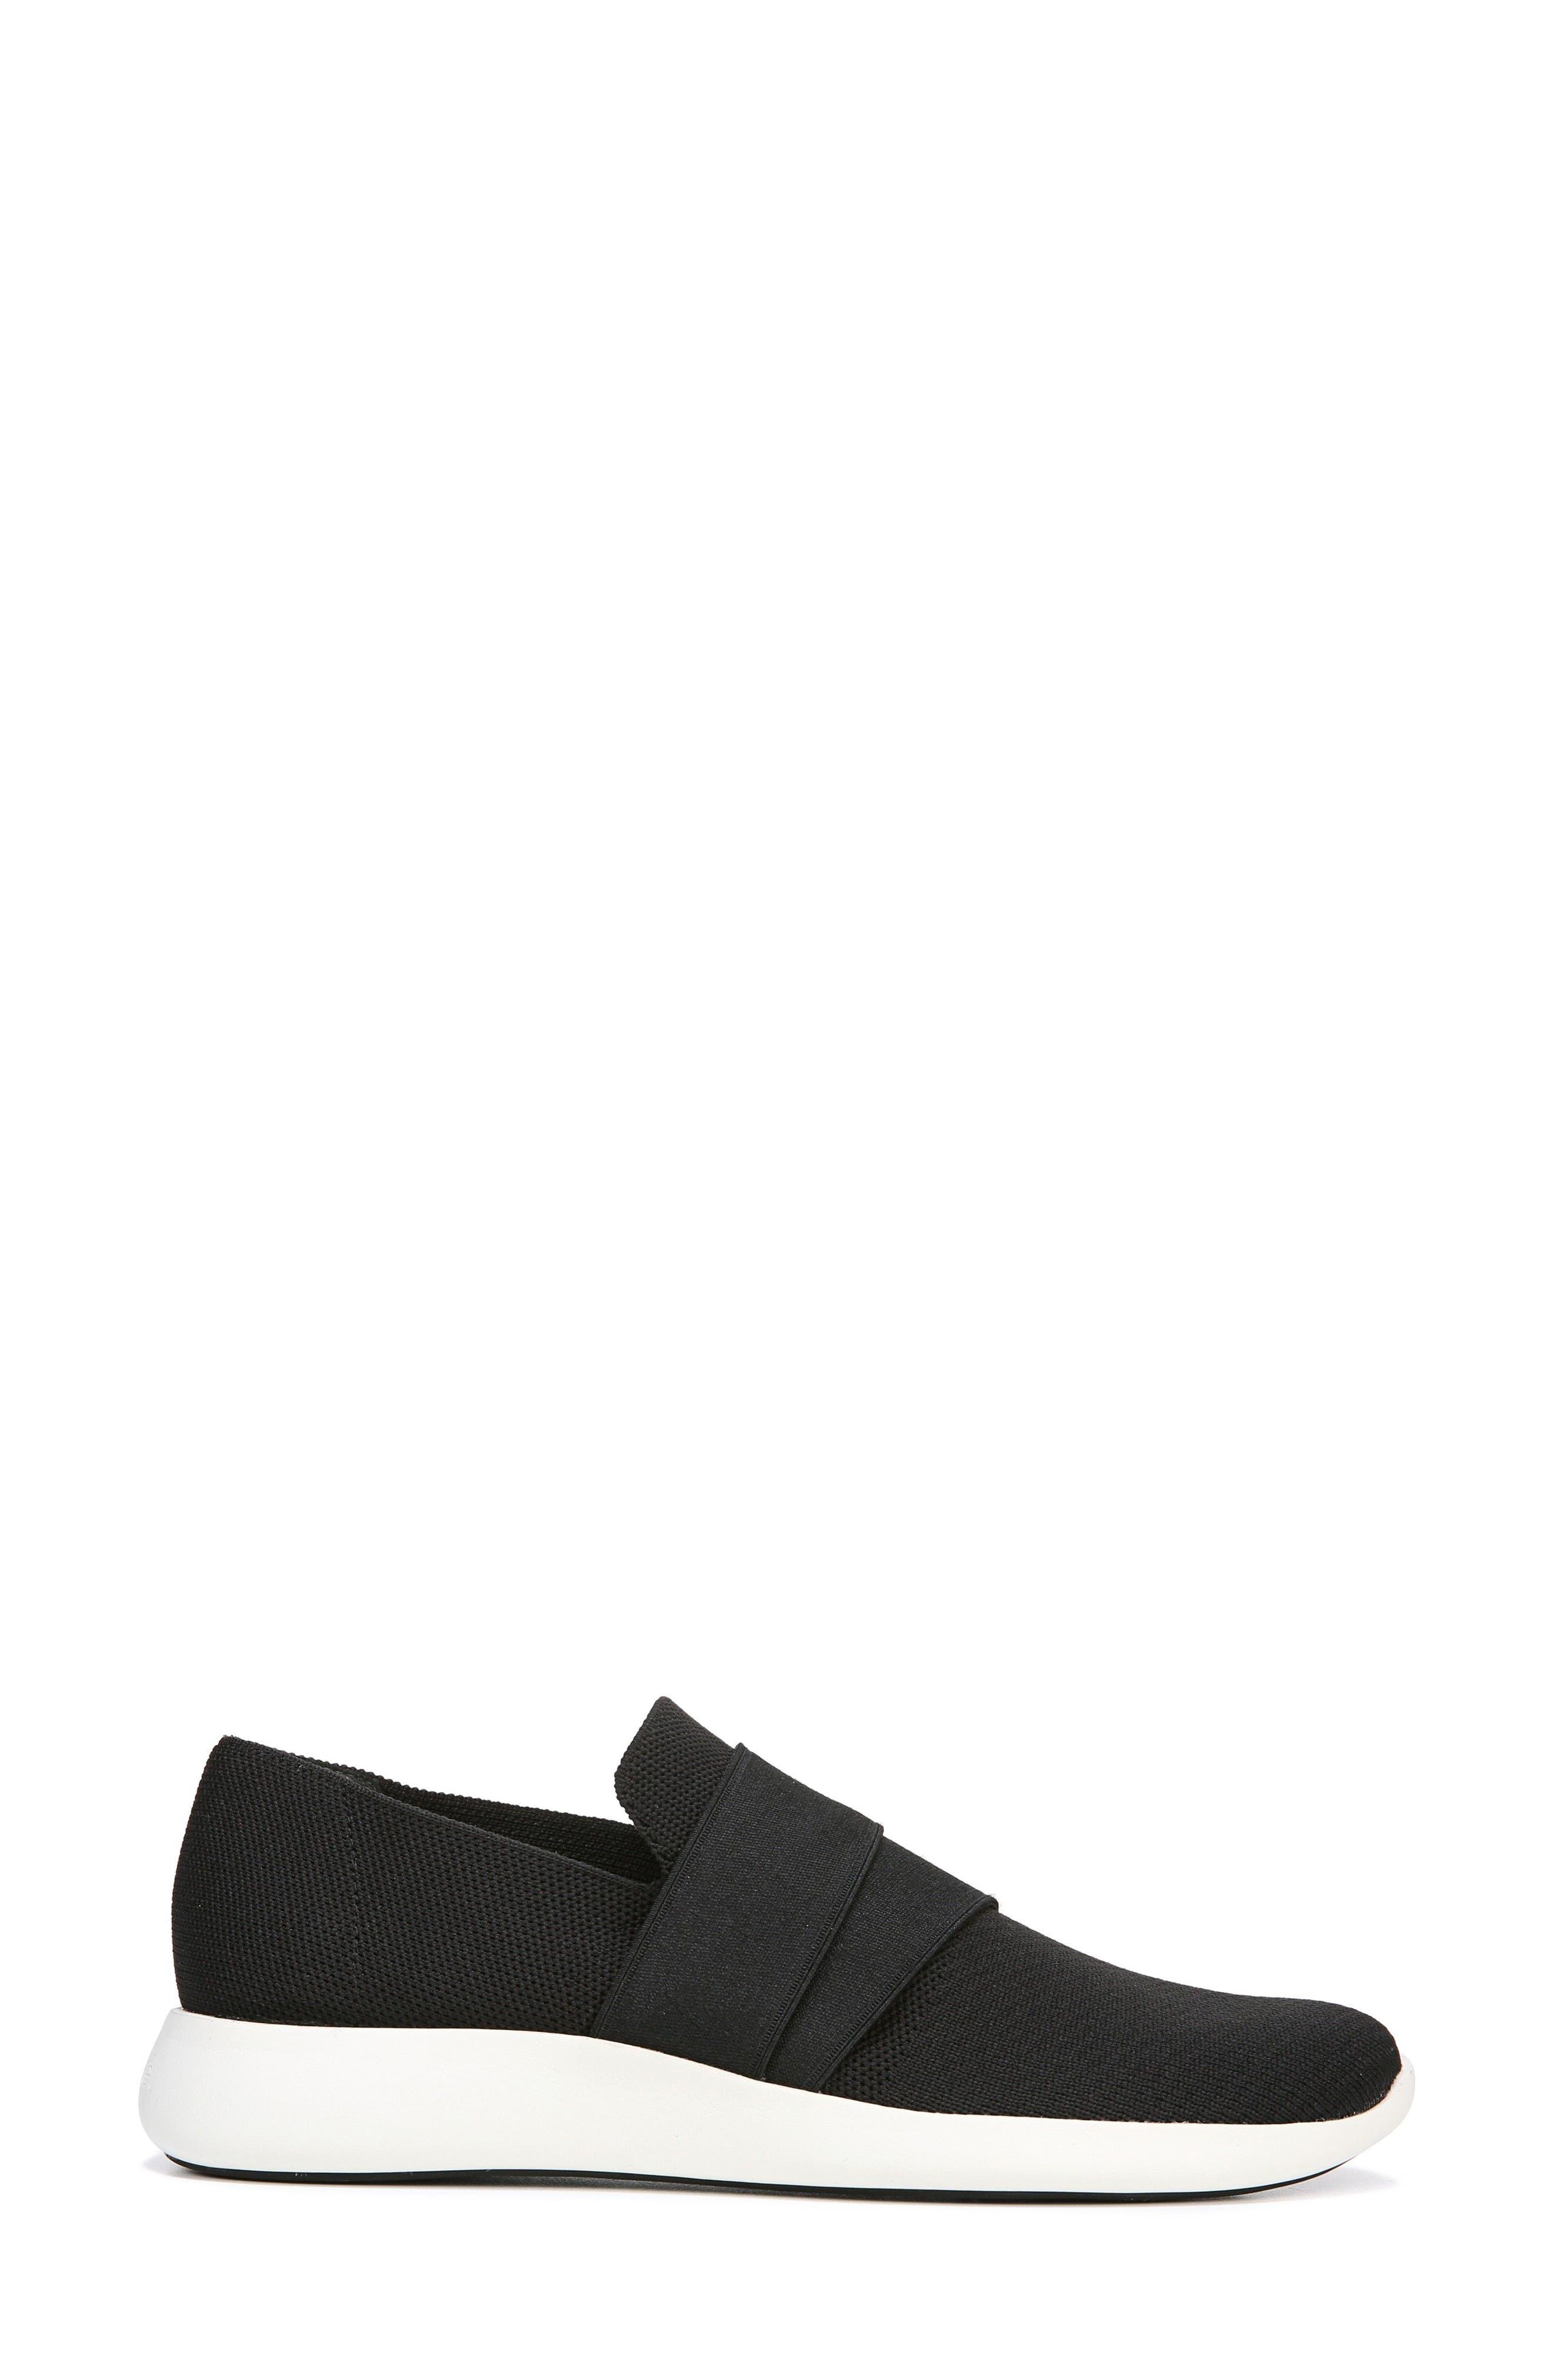 VINCE, Aston Slip-On Sneaker, Alternate thumbnail 3, color, BLACK SOLID KNIT